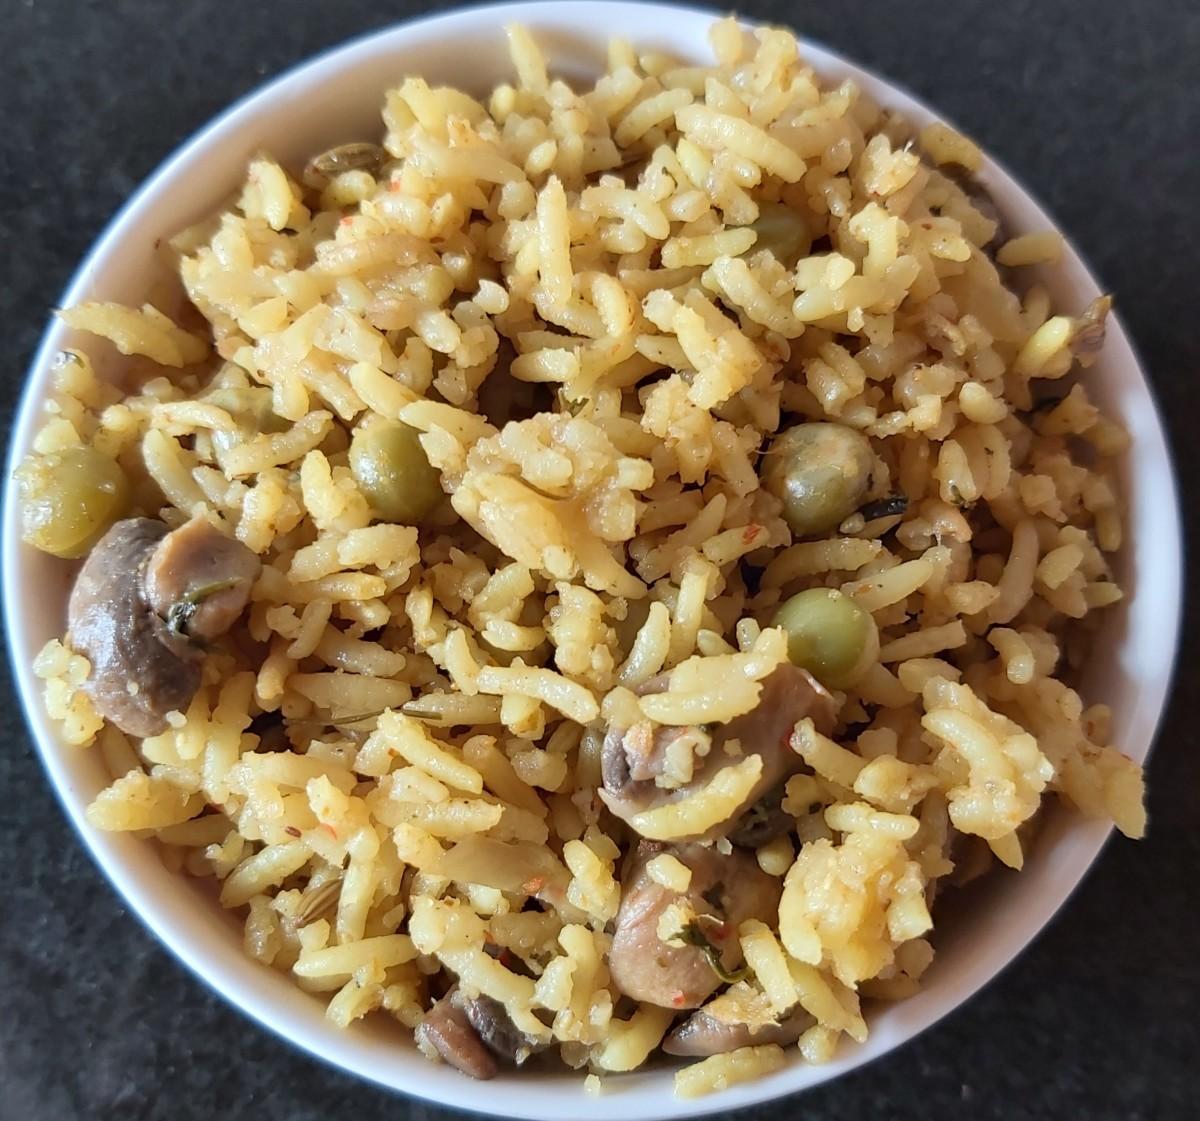 Mushroom and peas pulao is flavorful and mildly seasoned